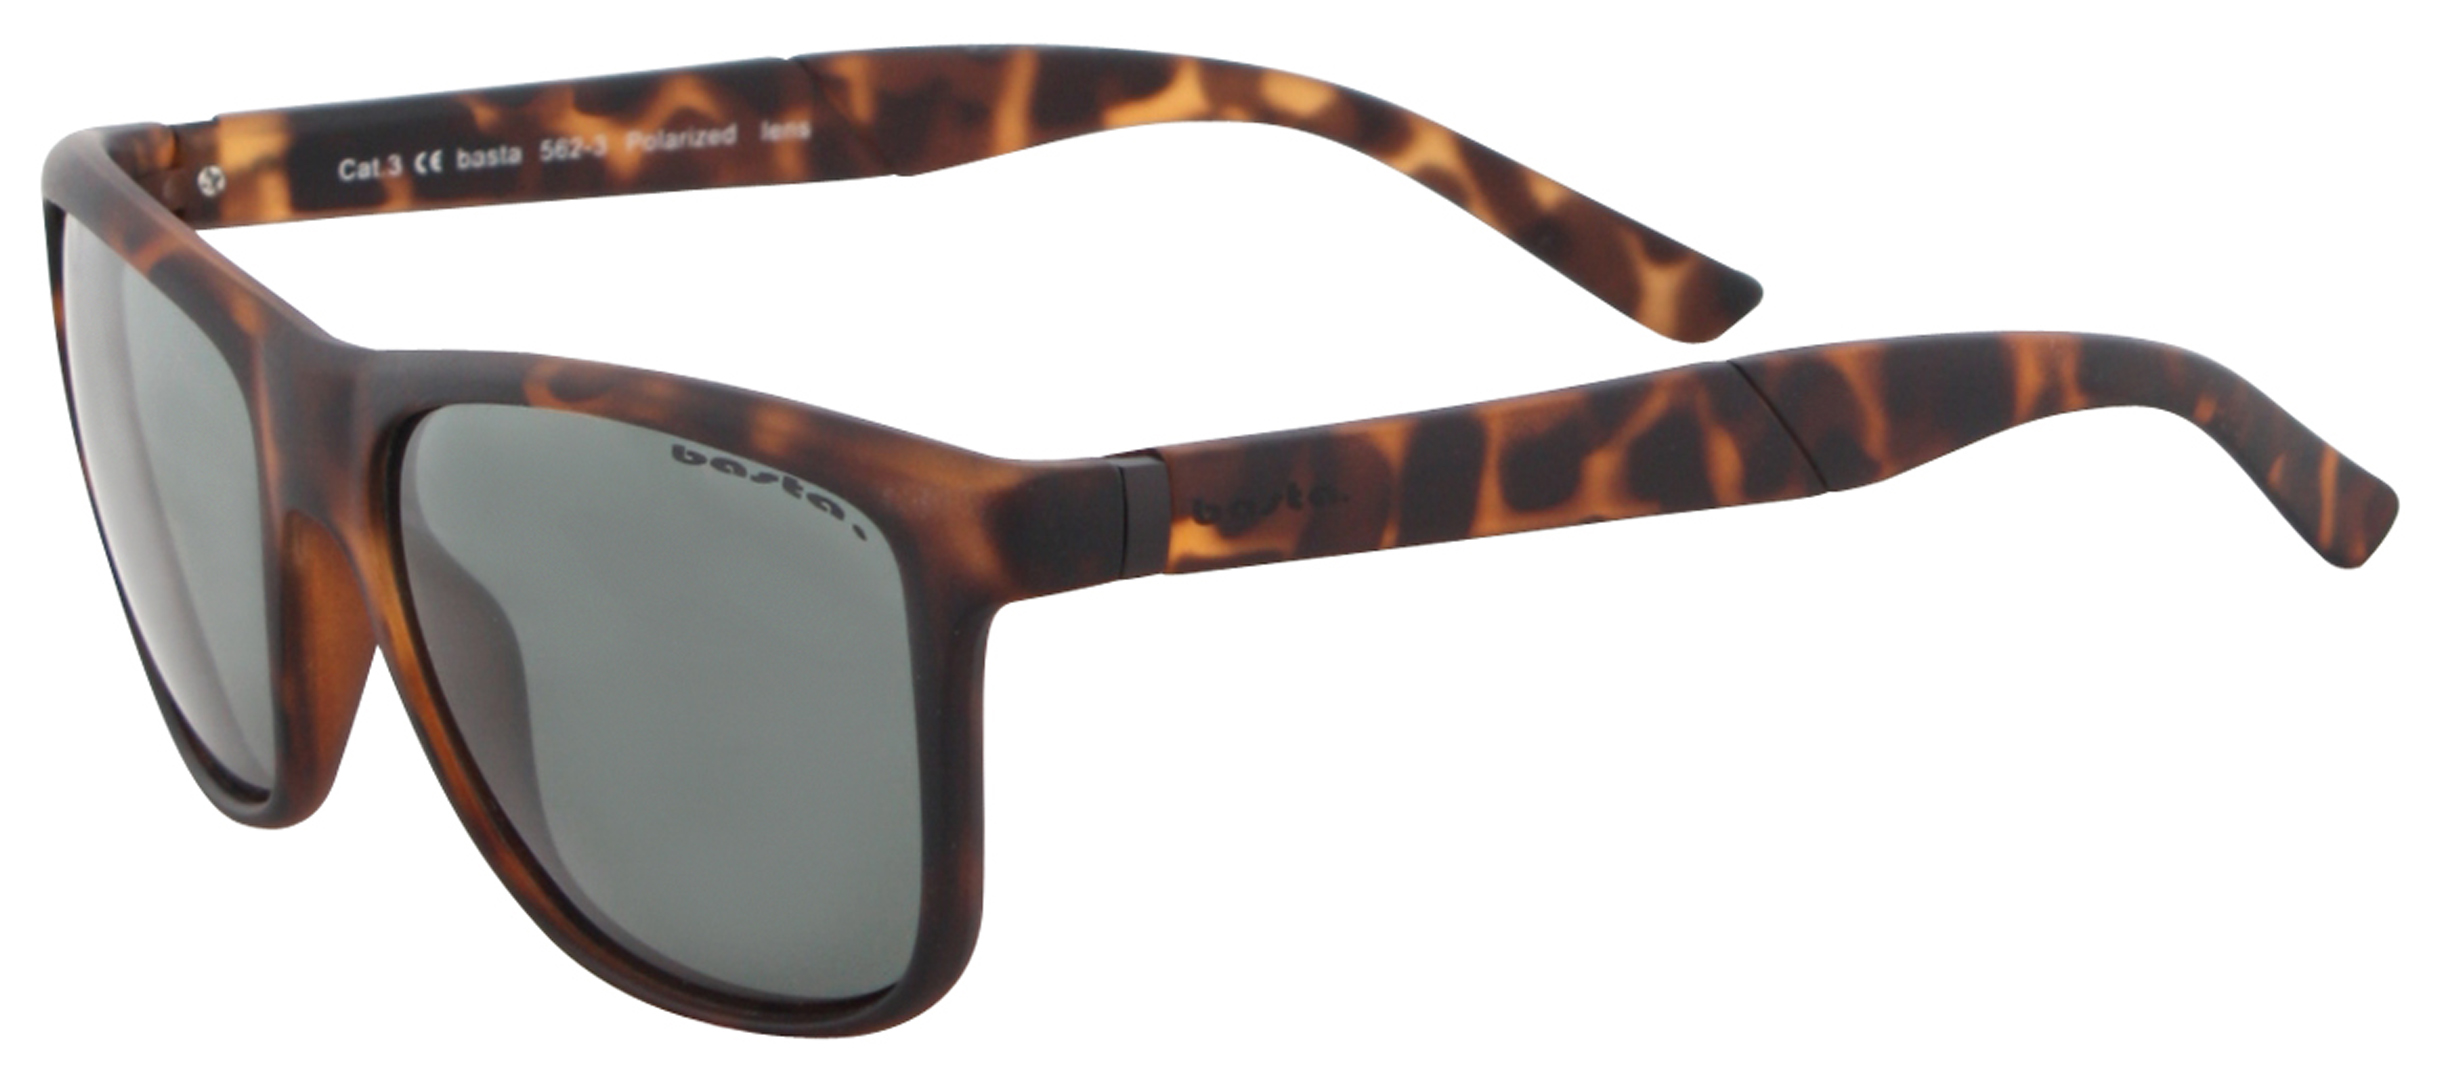 BASTA BASIC POLARIZED Sonnenbrille brown/brown dicAMV